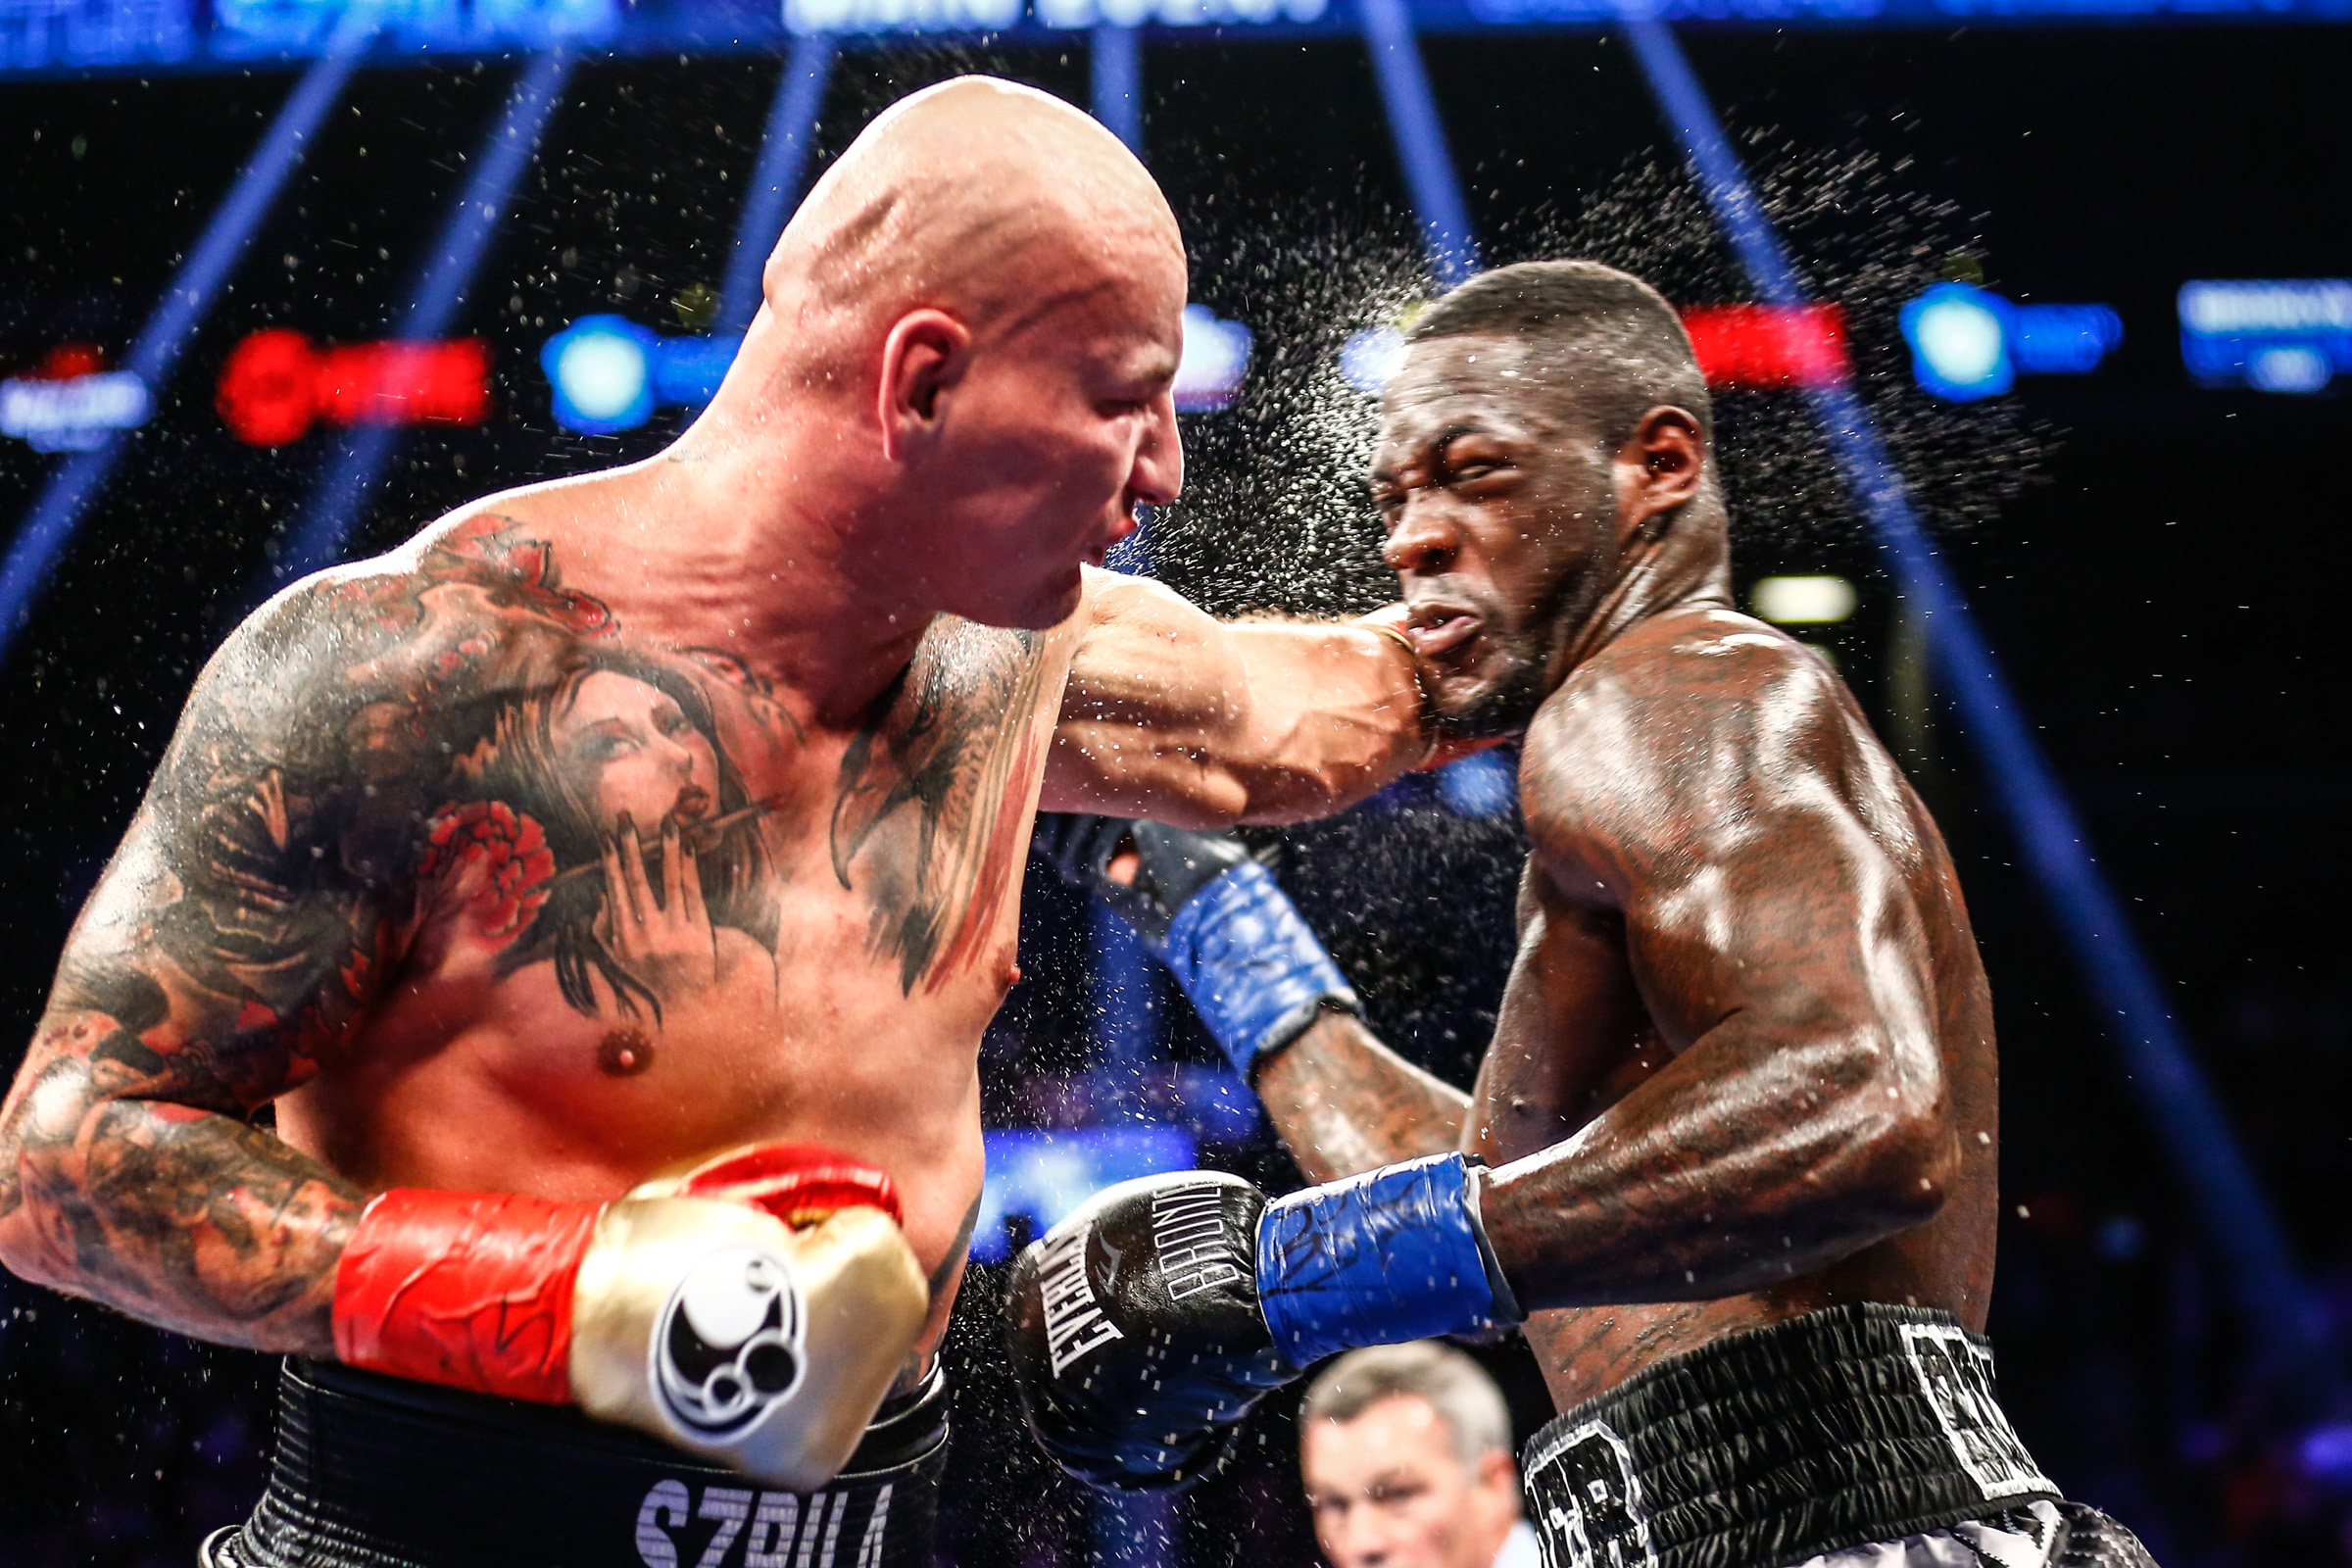 WILDER VS SZPILKA-FIGHT NIGHT-01162016-1509.jpg